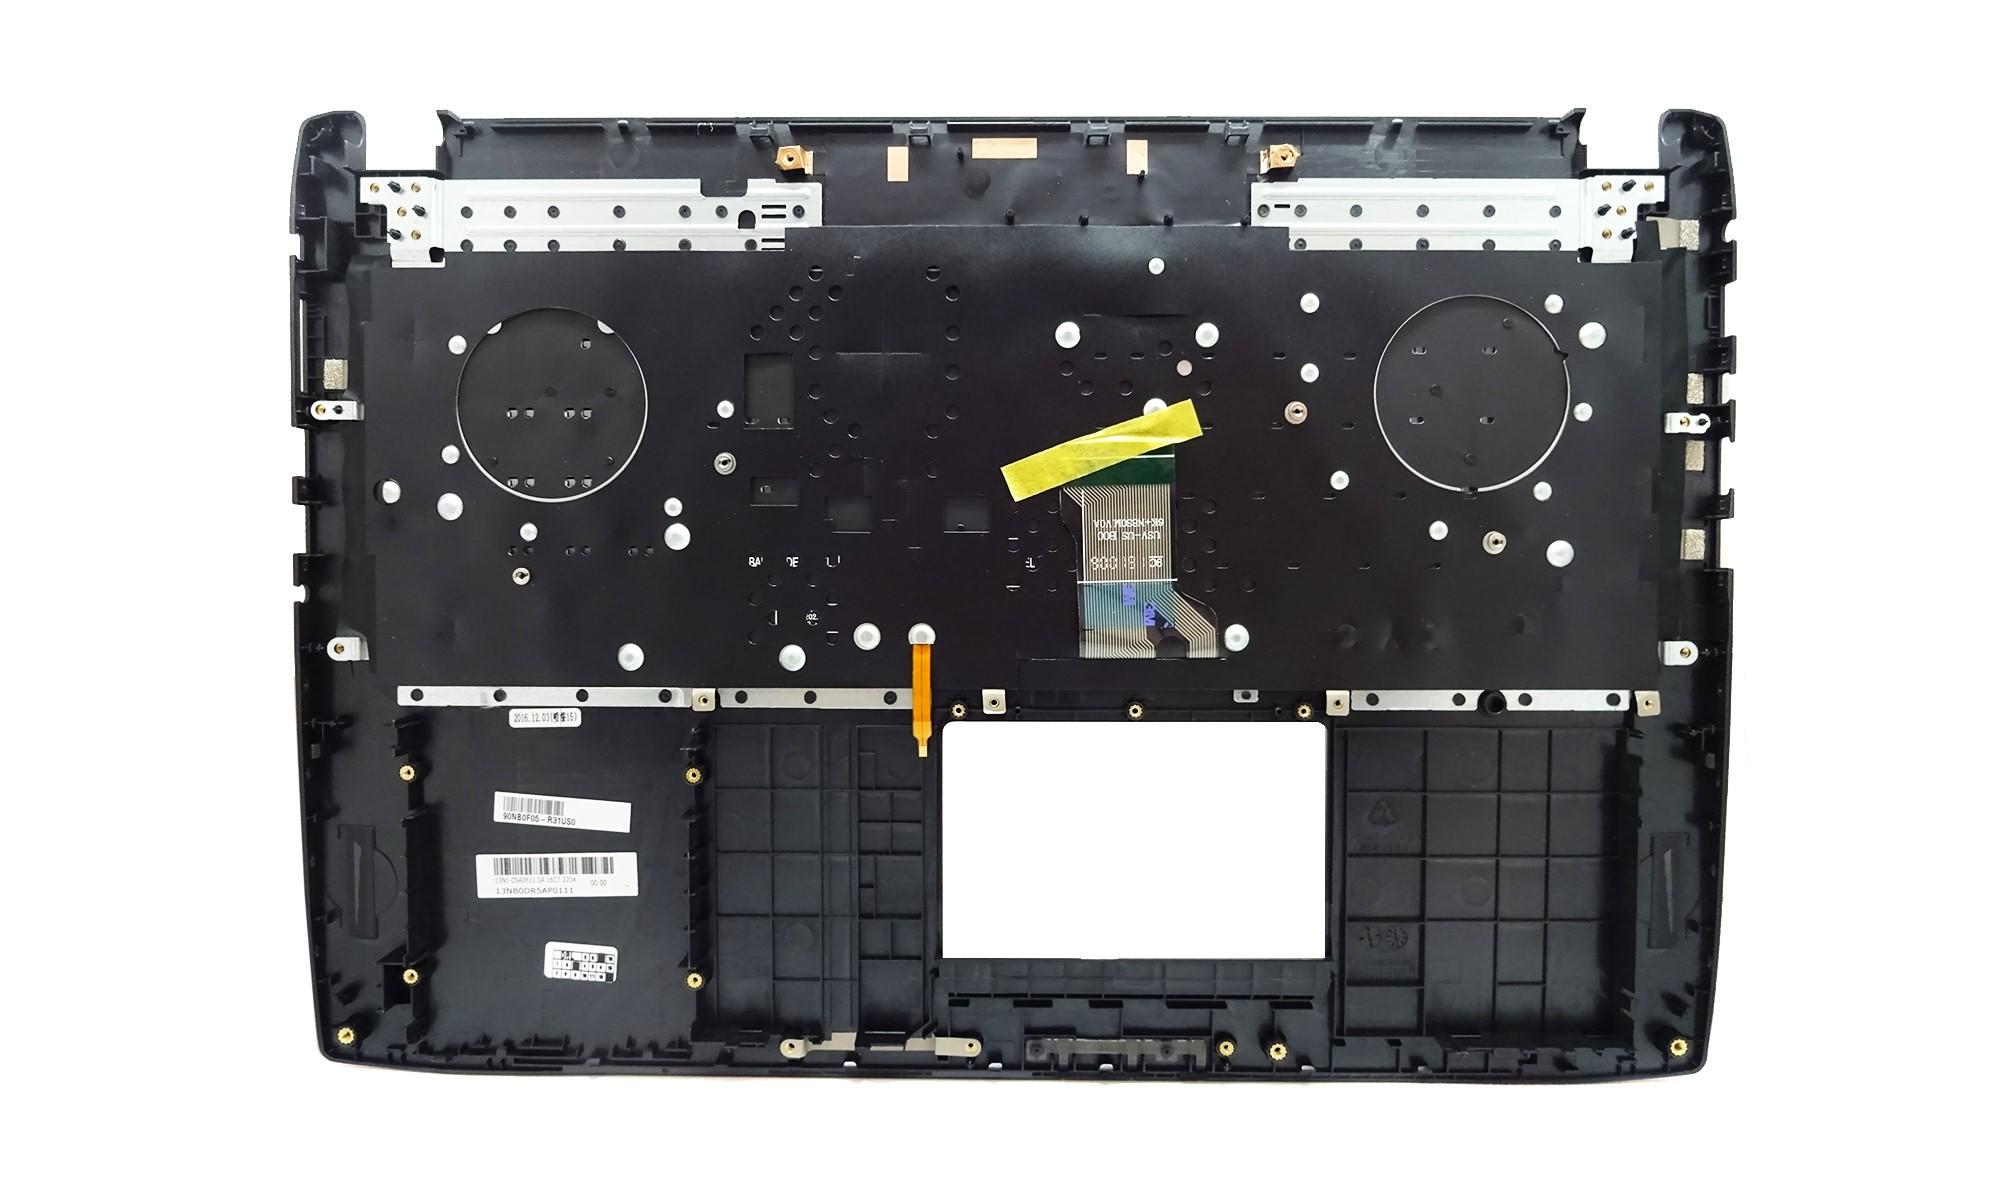 Carcasa superioara si tastatura originala Asus ROG FX502VD, FX502VM, FX502VS, FX502VT, FX502VY, FX60VM, layout US, neagra, cu iluminare, model 90NB0F05-R31US0